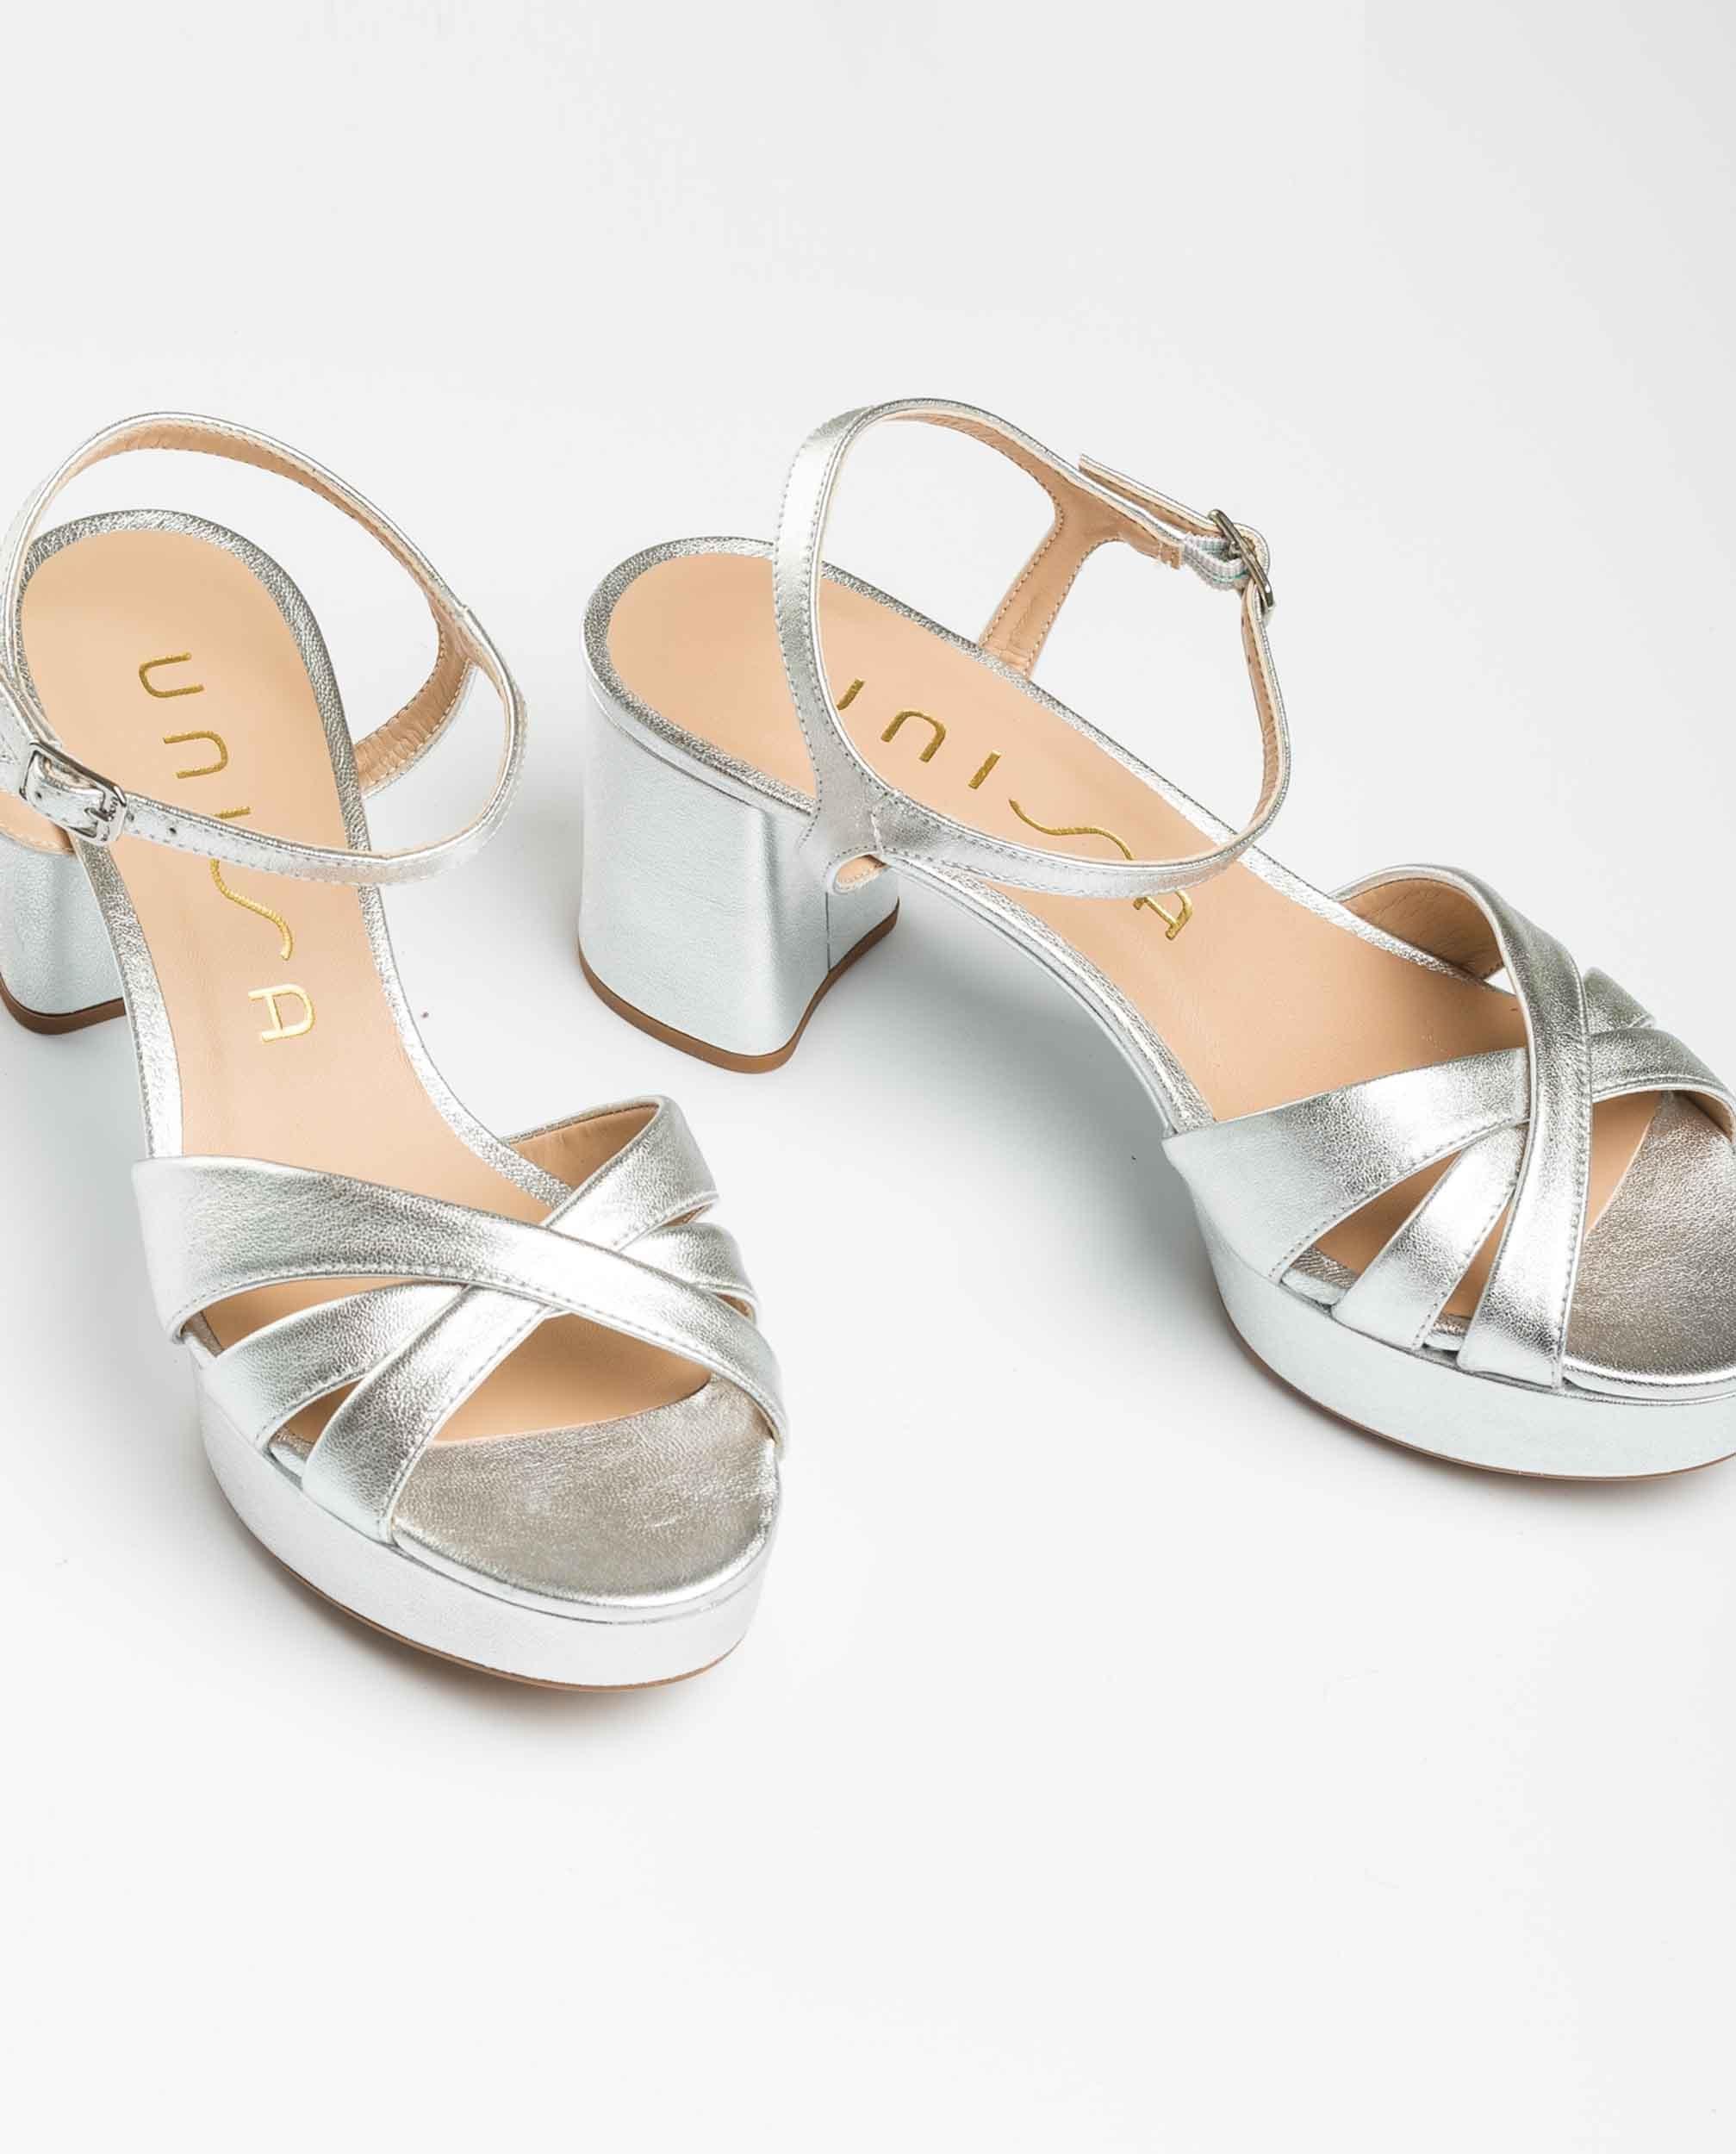 UNISA Metal effect crossed straps sandals NETA_LMT silver 2